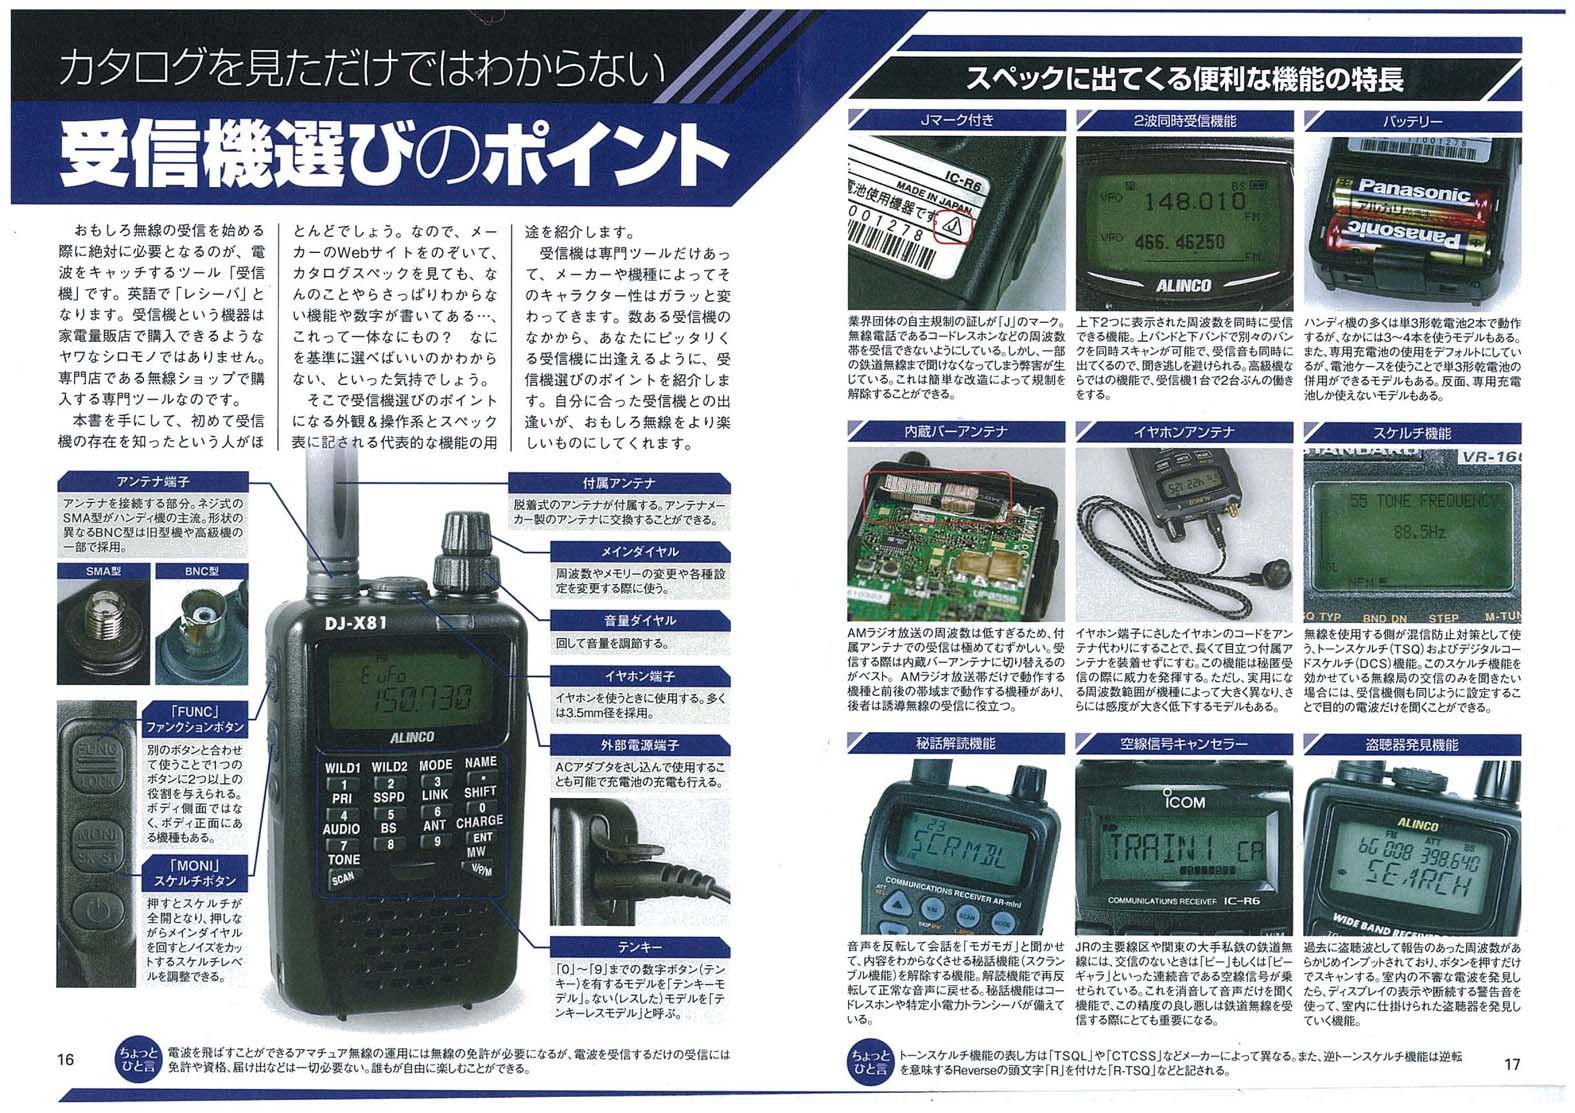 img-4152336